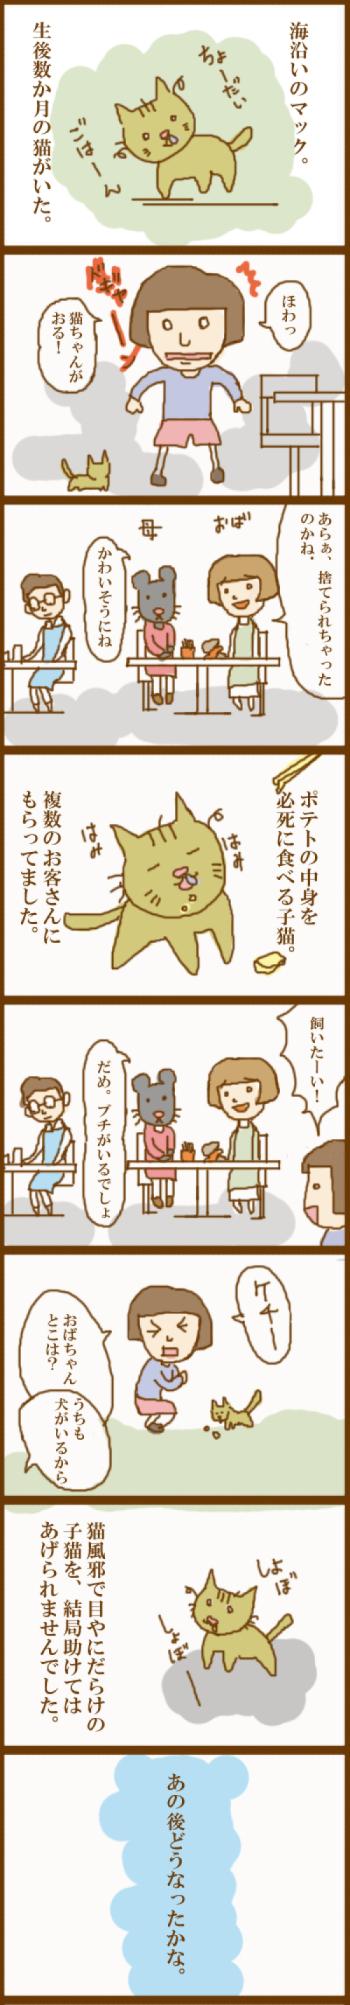 f:id:suzuokayu:20201011194021j:plain